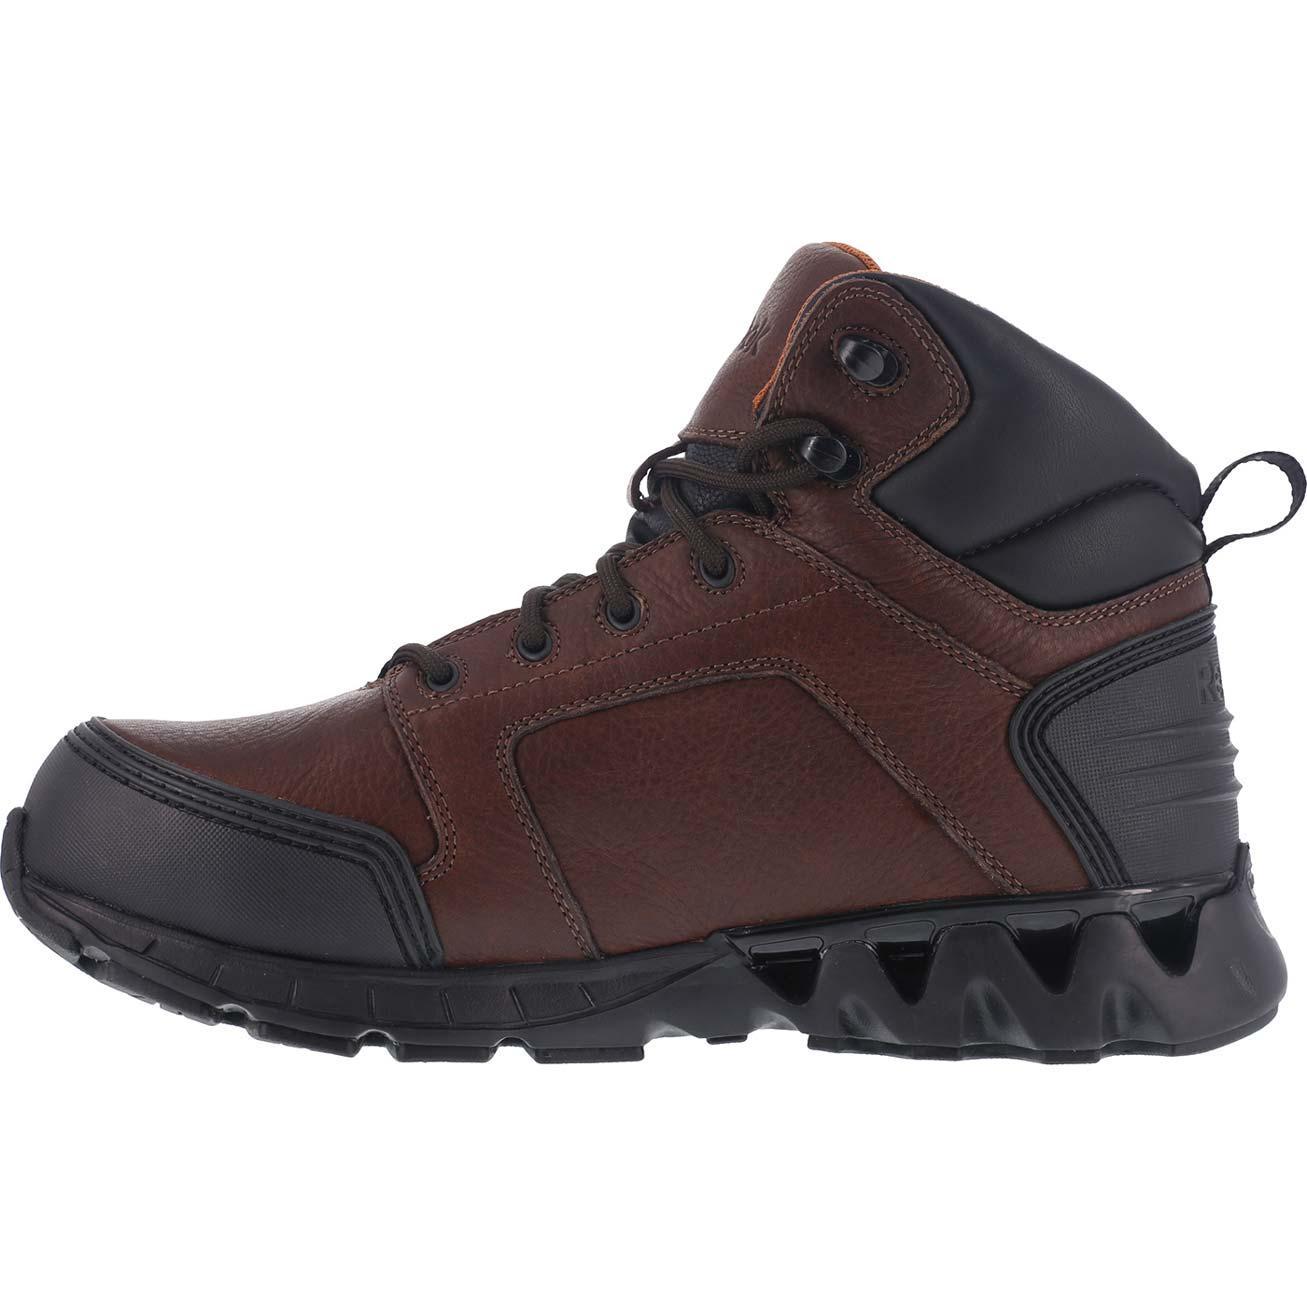 Reebok Zigkick Work Carbon Toe Internal Metatarsal Work Hiker 321336dd6